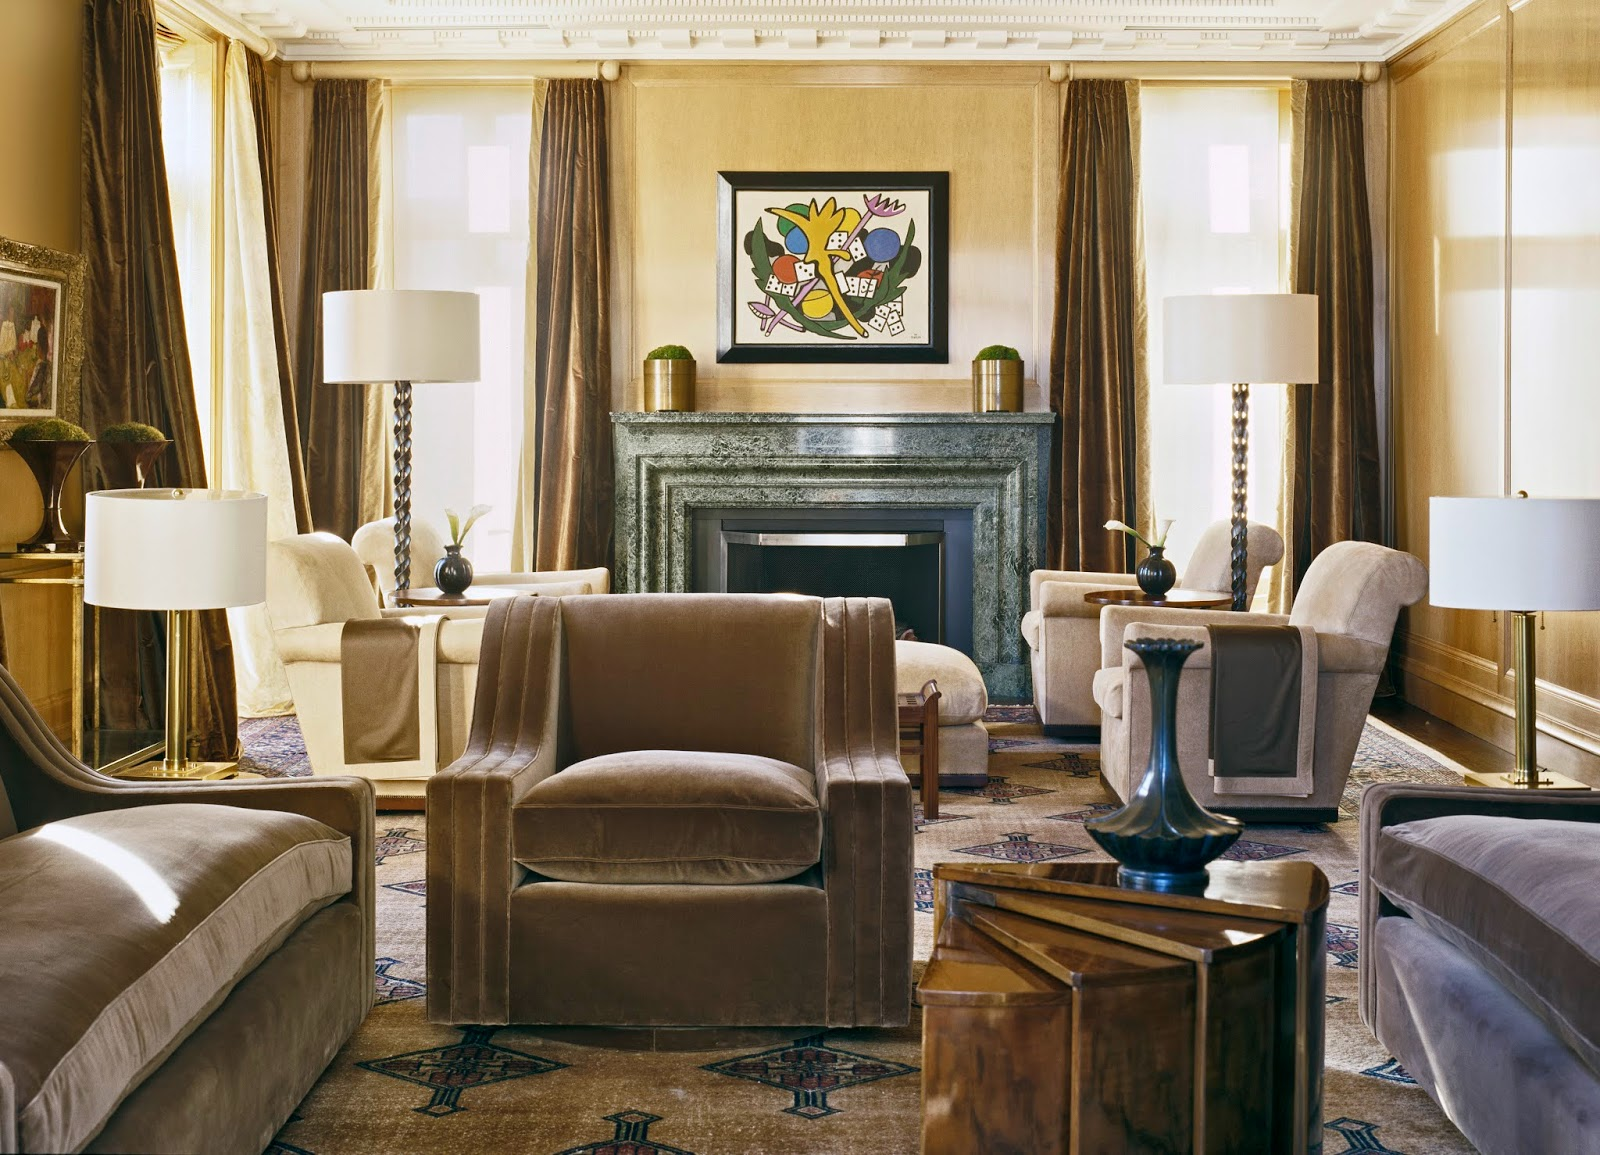 splendid sass simplicity nancy braithwaite. Black Bedroom Furniture Sets. Home Design Ideas